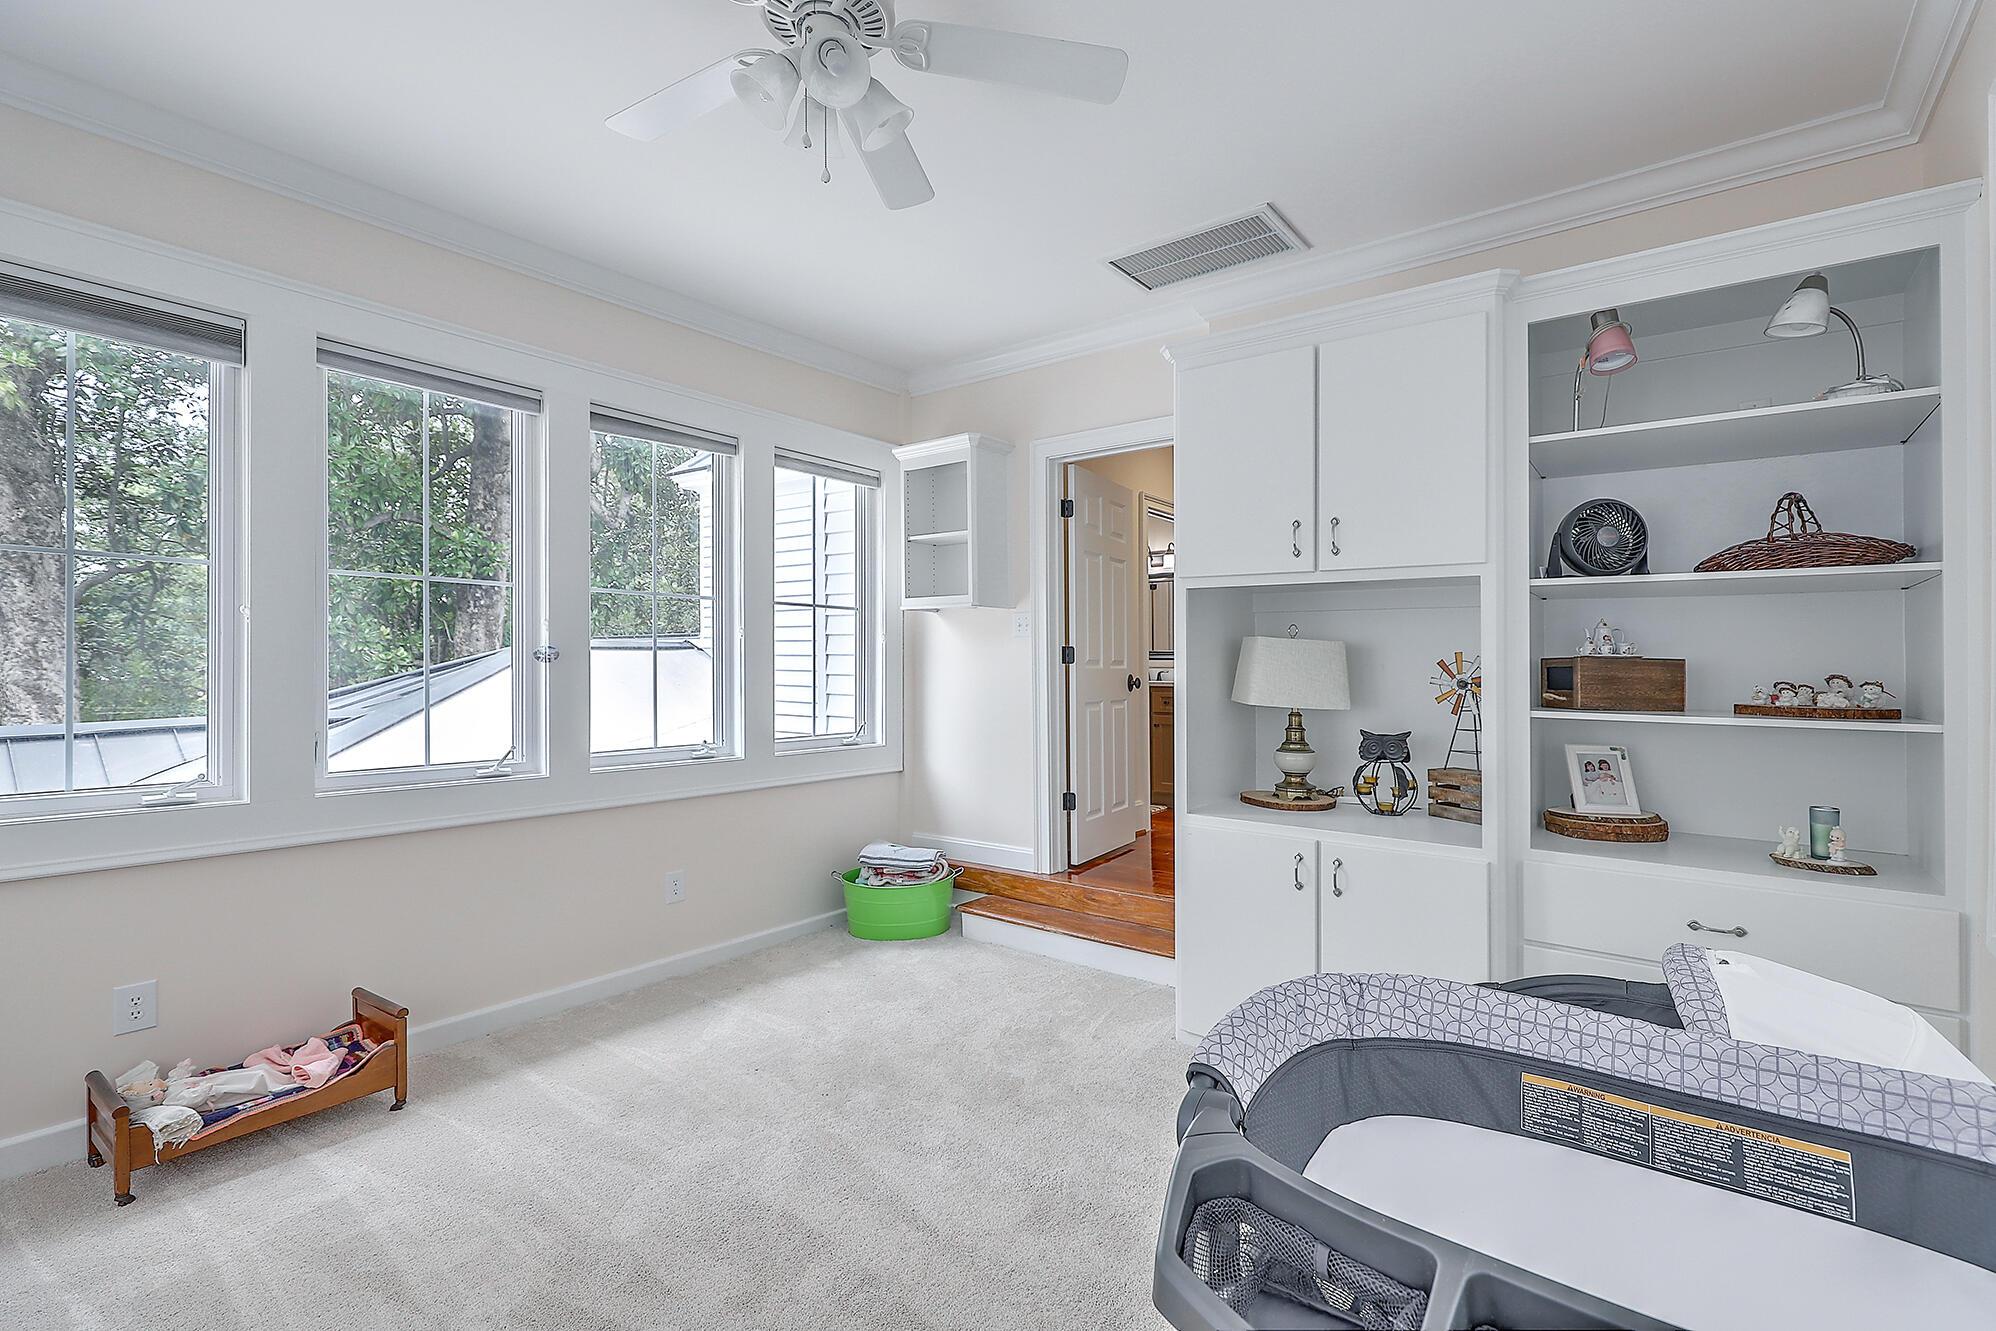 Summerville Homes For Sale - 102 Hickory, Summerville, SC - 88